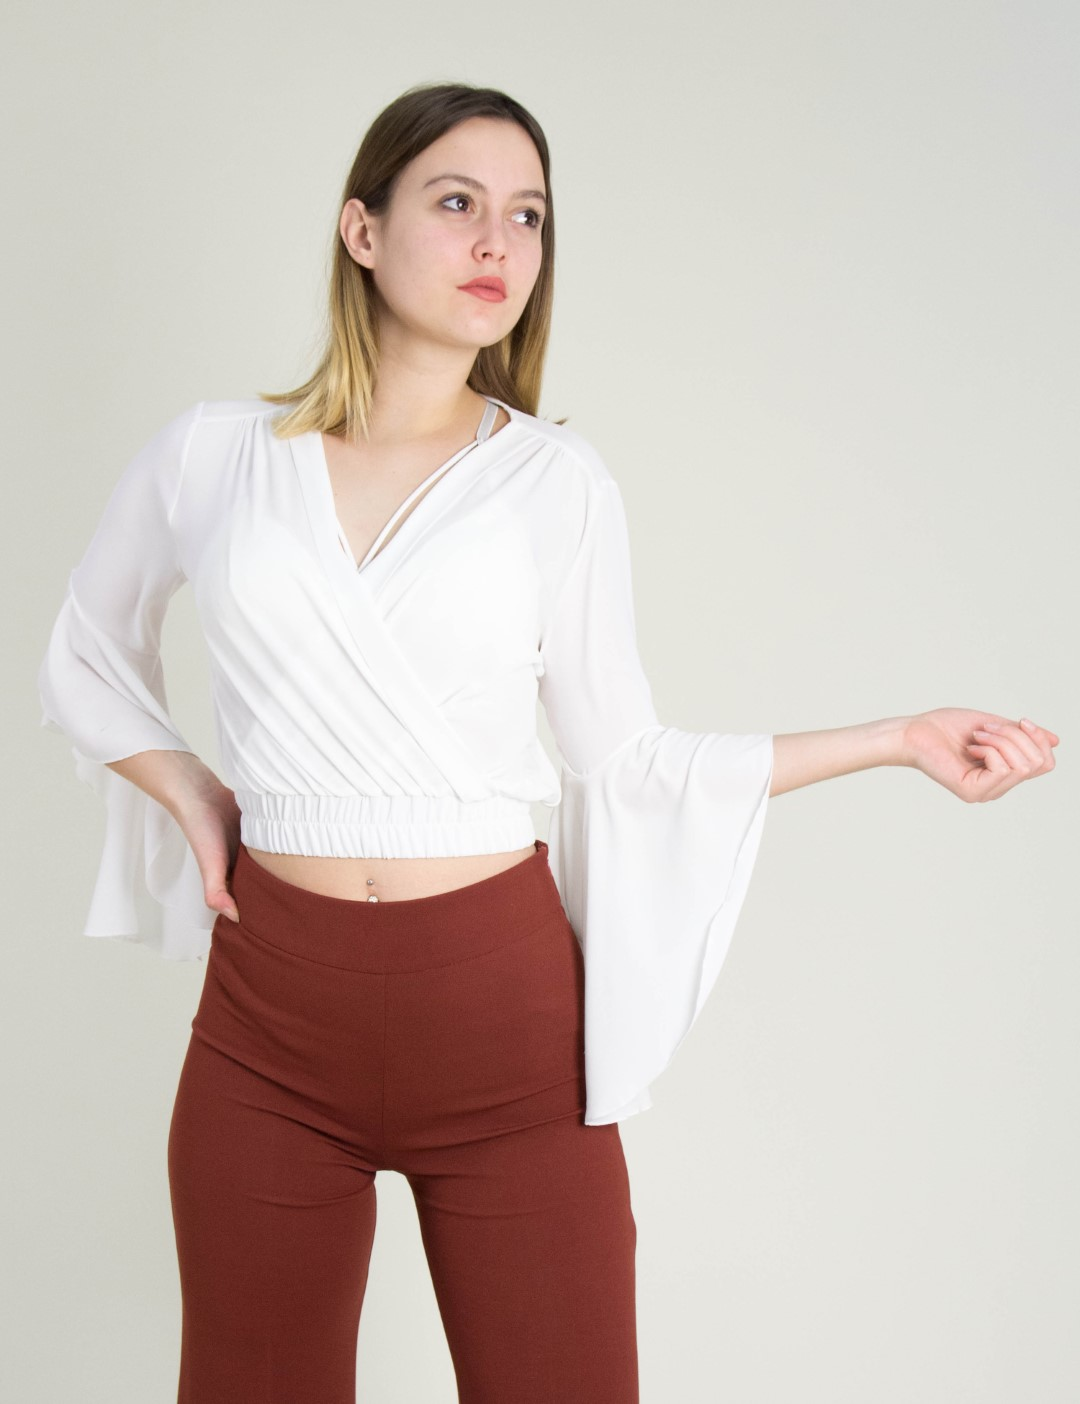 3b414384de60 Γυναικεία λευκή σιφόν κρουαζέ μπλούζα βολάν Cocktail 014206000B